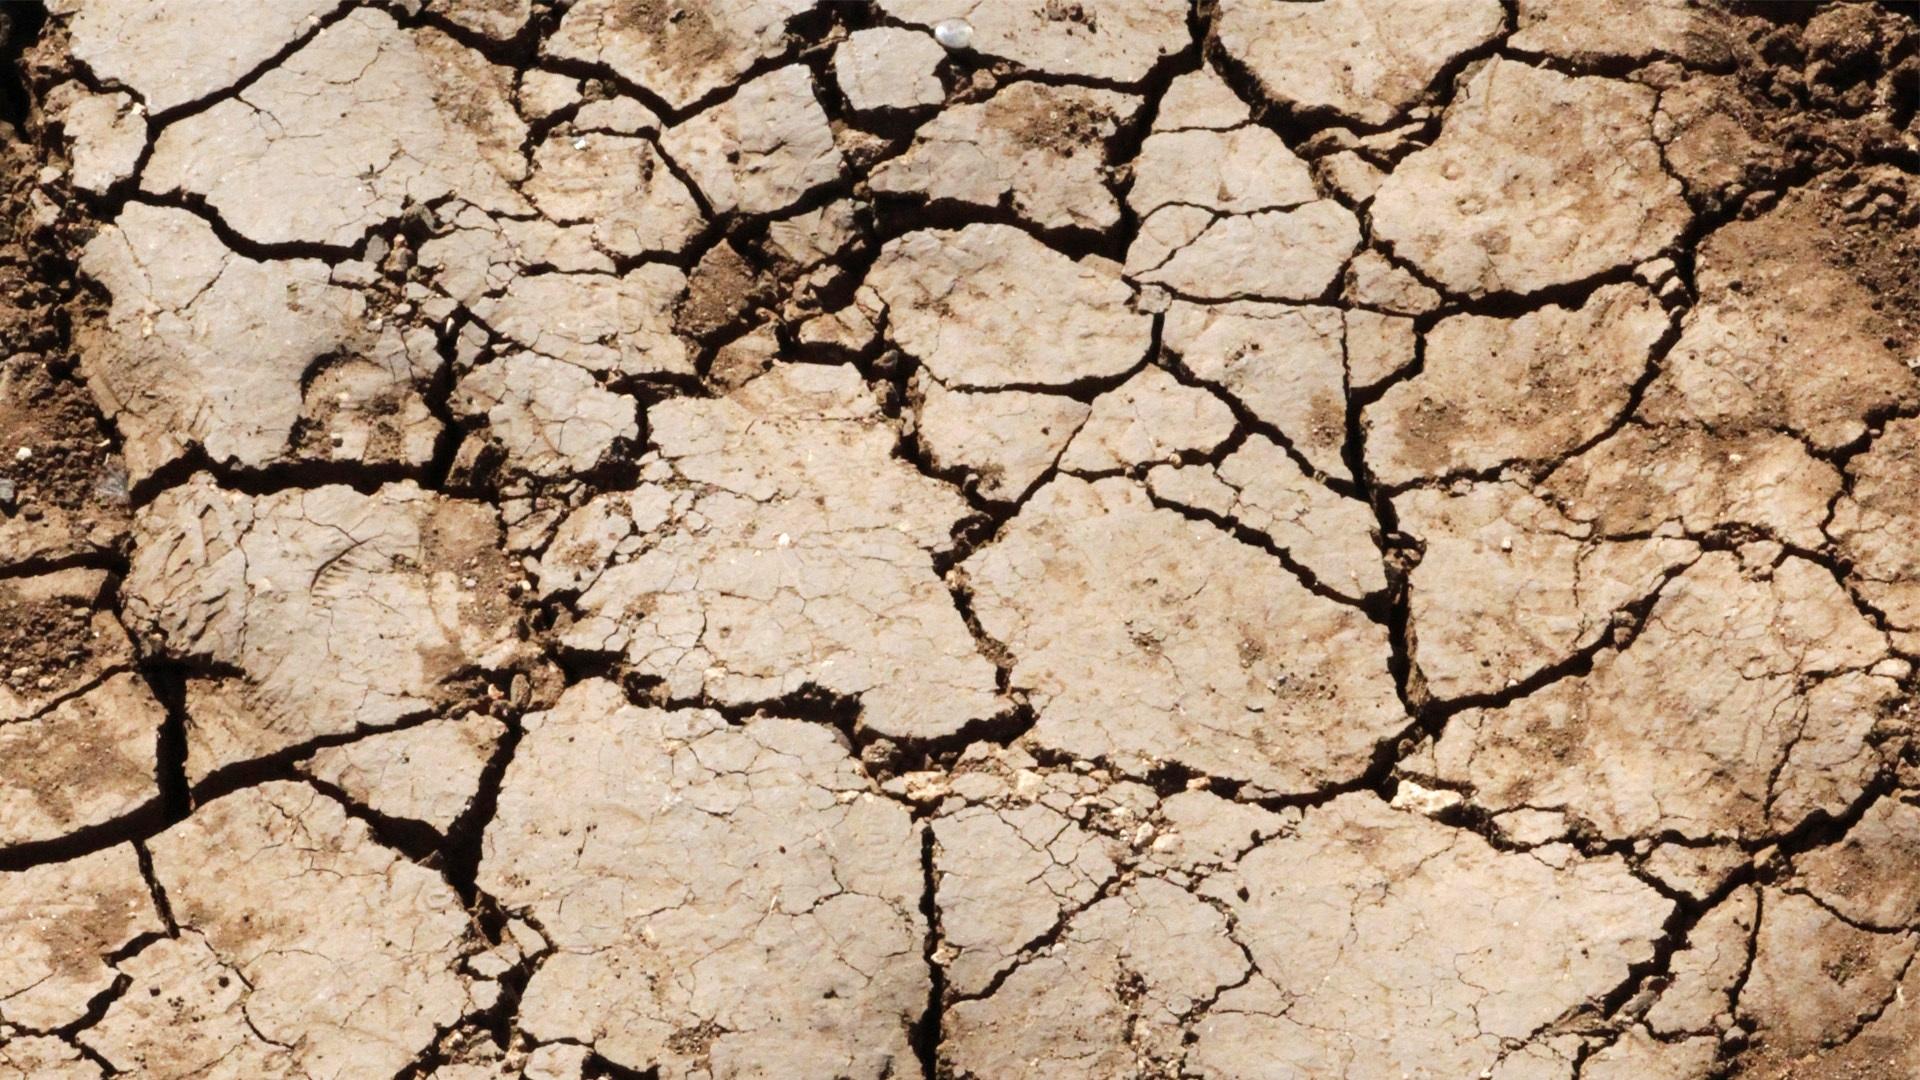 free images desert dry soil crack stone wall earth